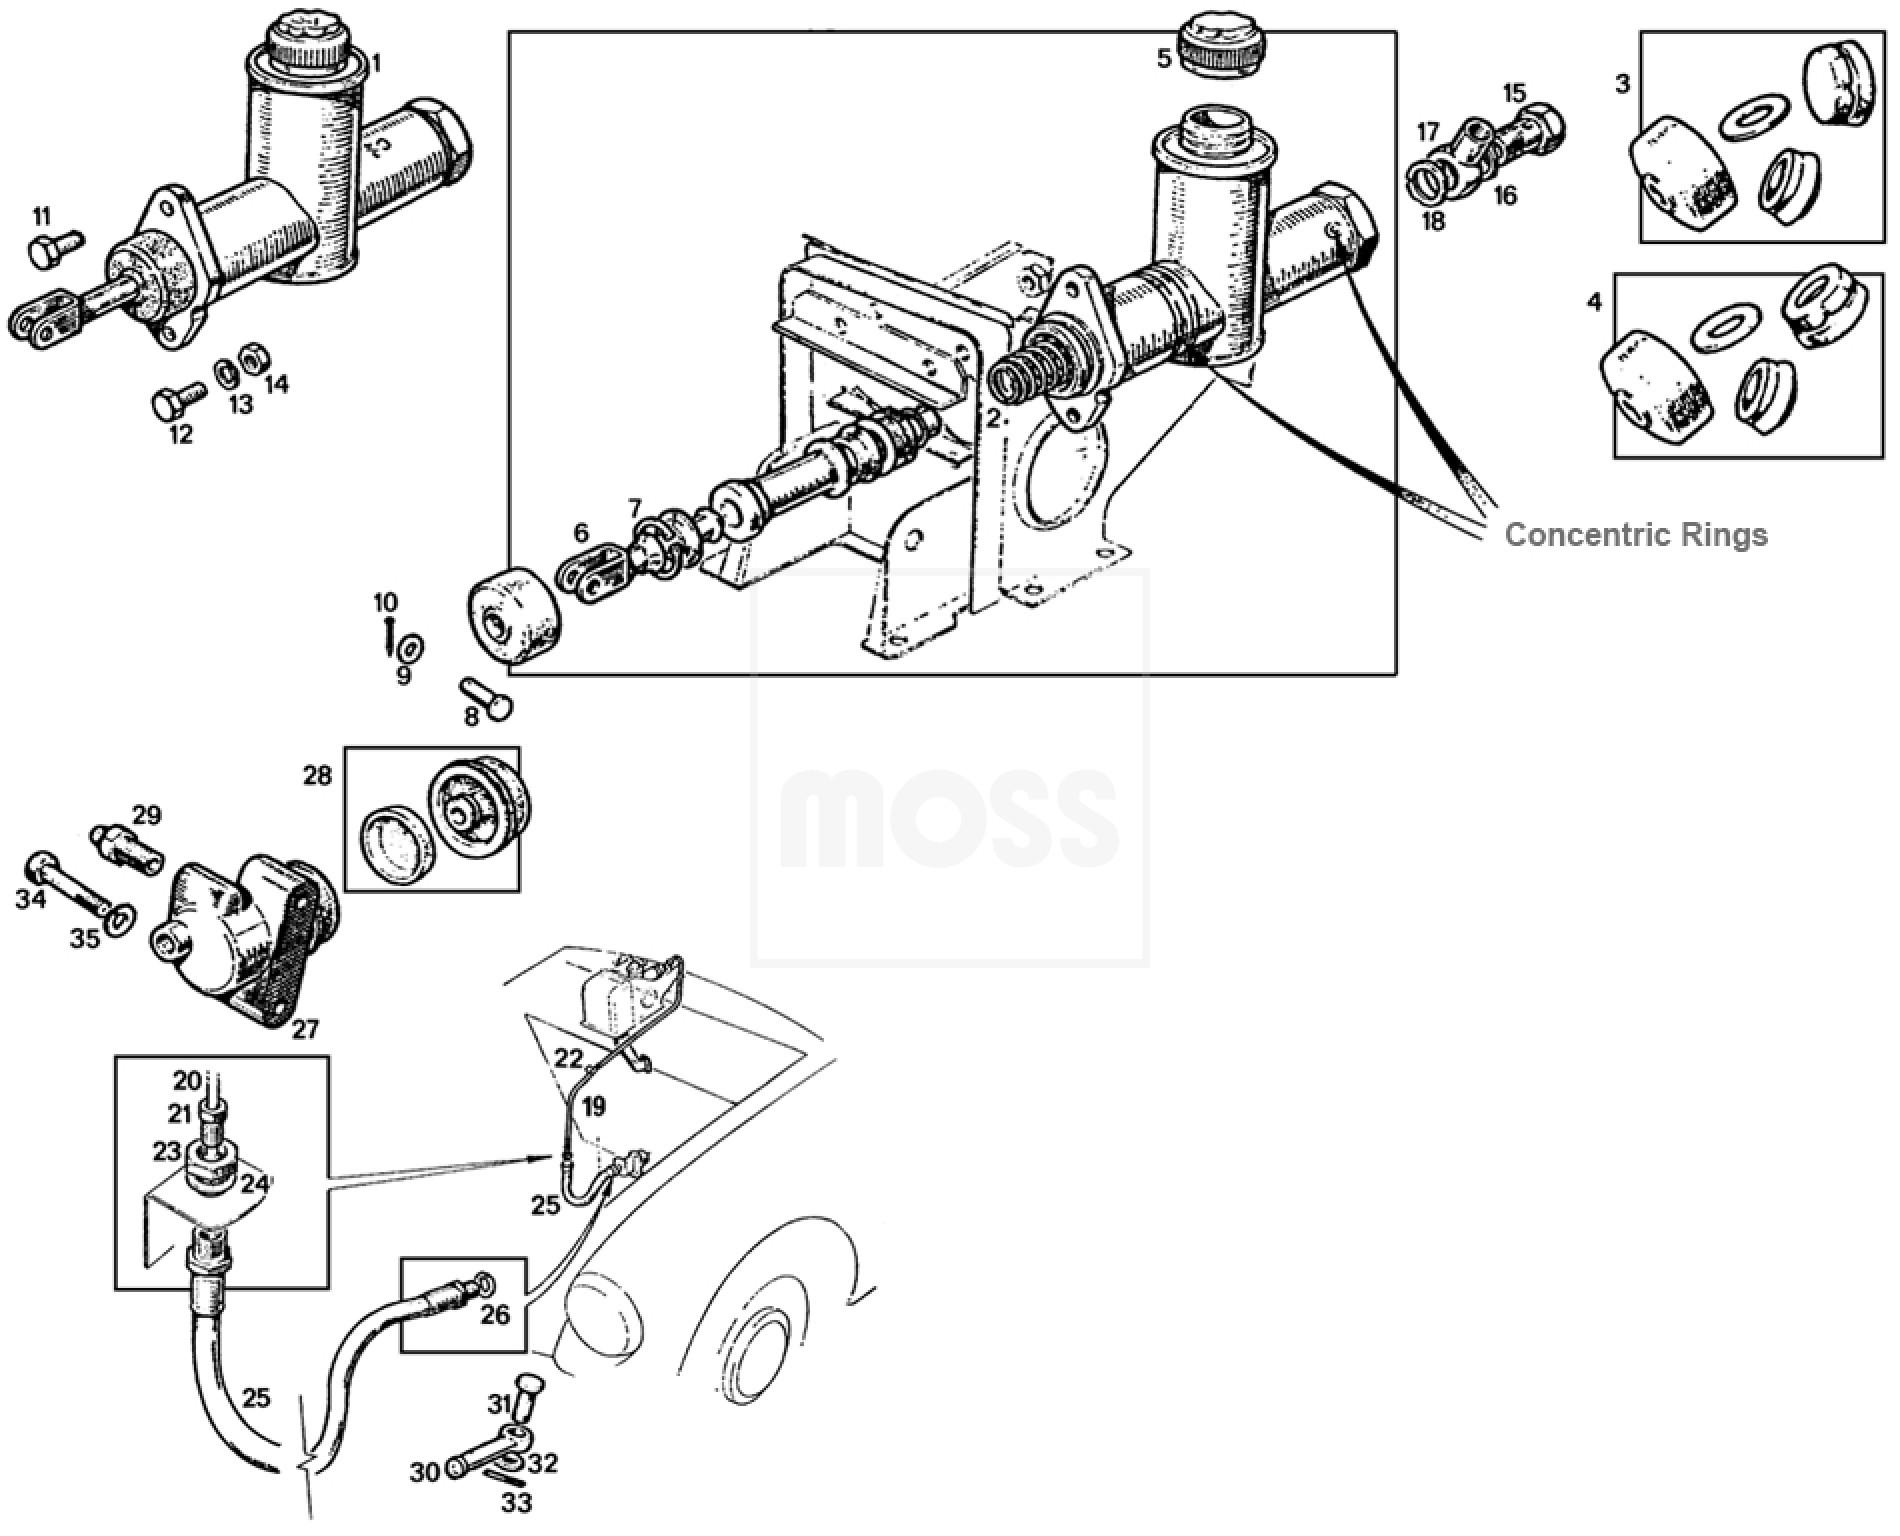 mg midget 1500 wiring diagram trailer hitch 5 pin 1969 transmission